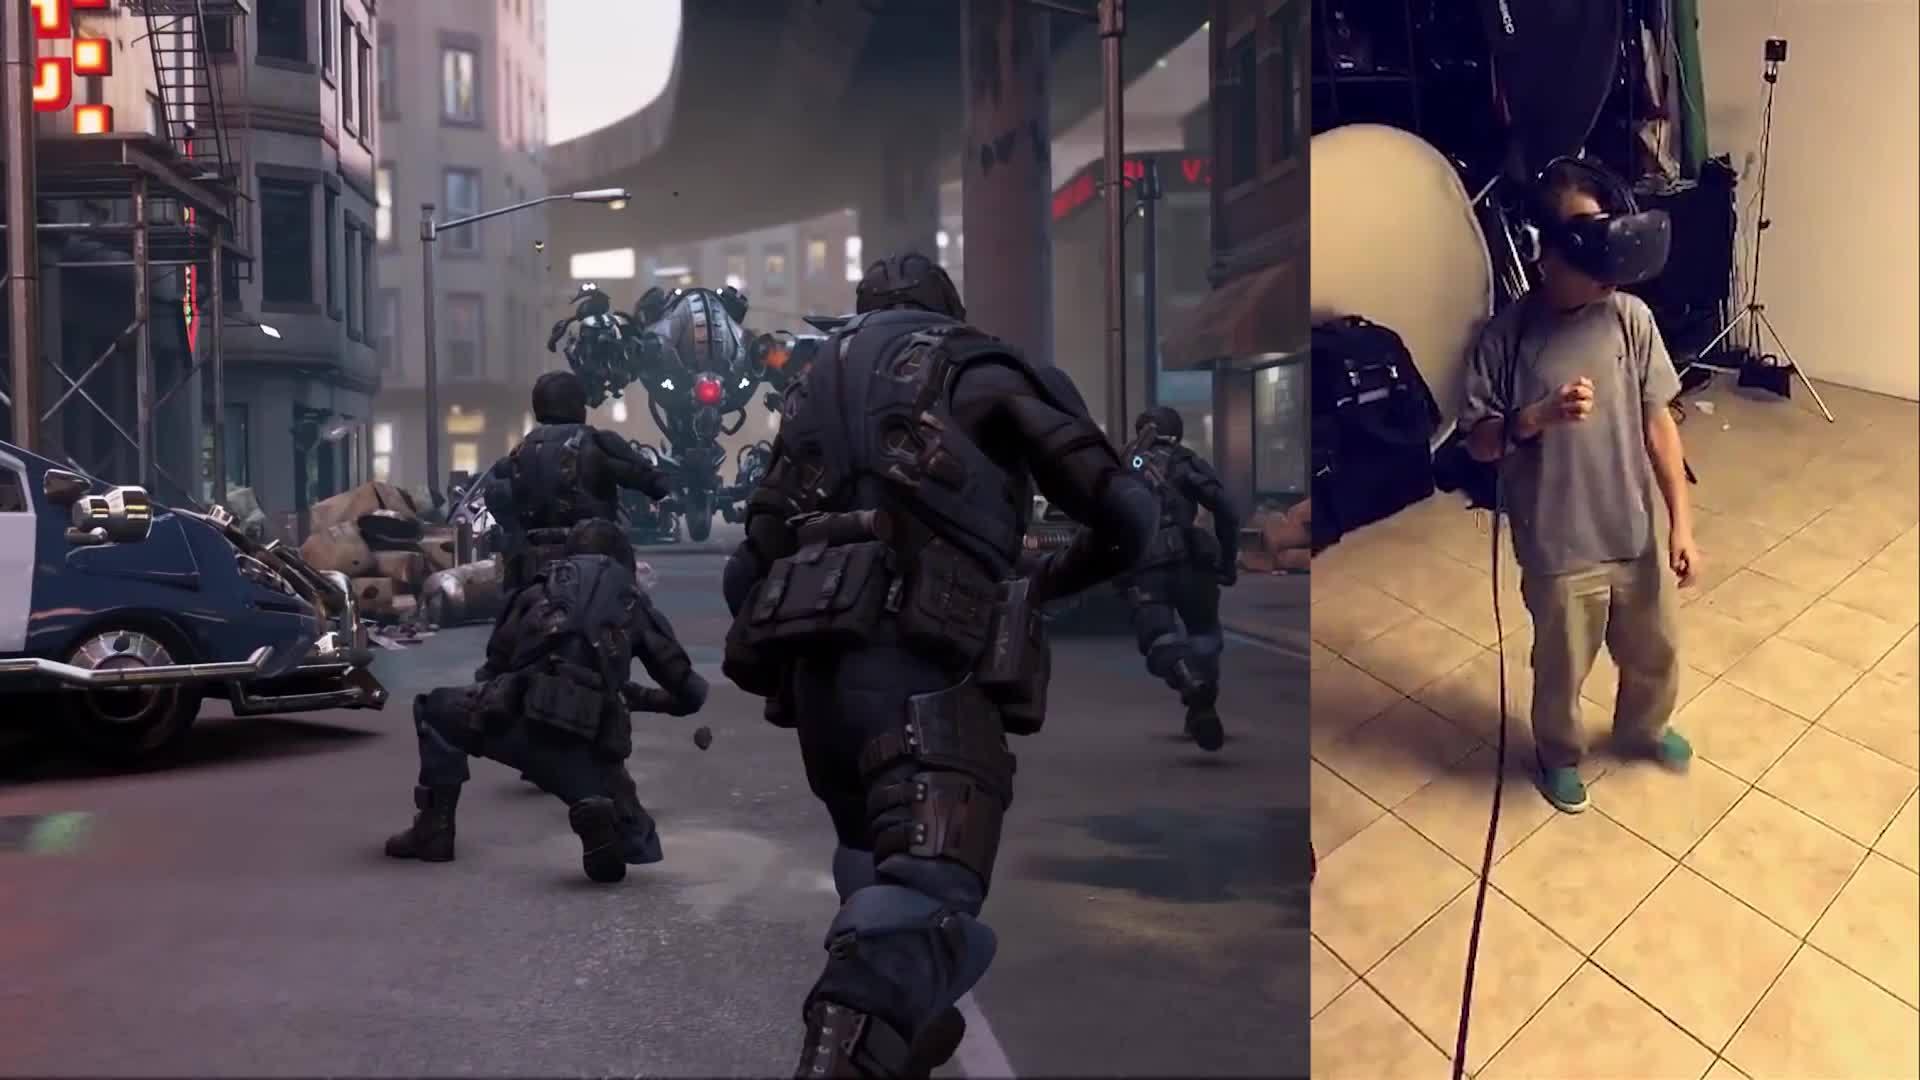 htc, virtualreality, vive, Kid reacts to virtual reality demo on HTC Vive GIFs